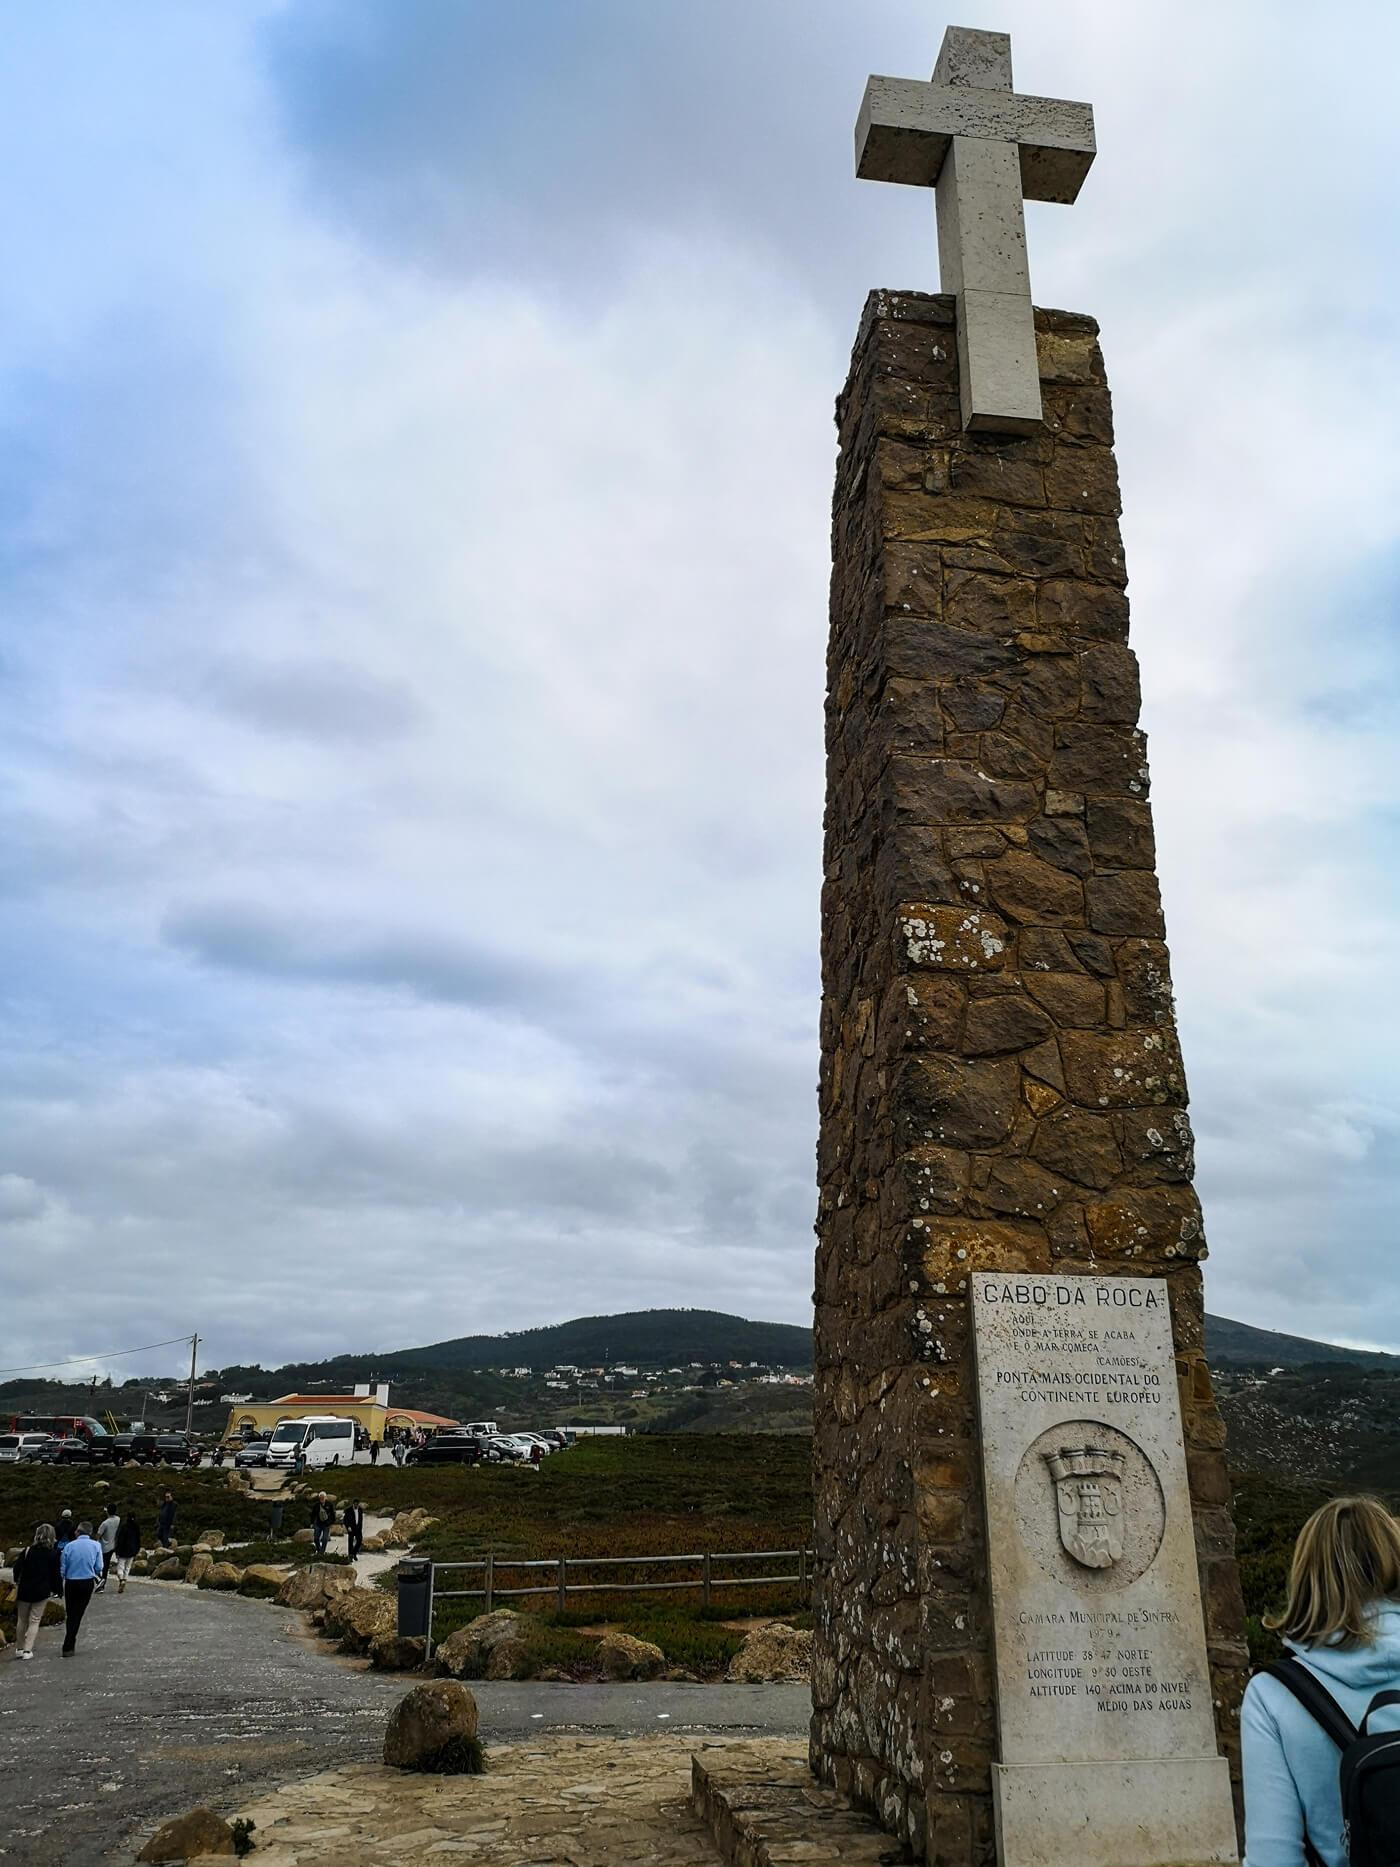 A close up shot of the Cabo Da Roca monument.